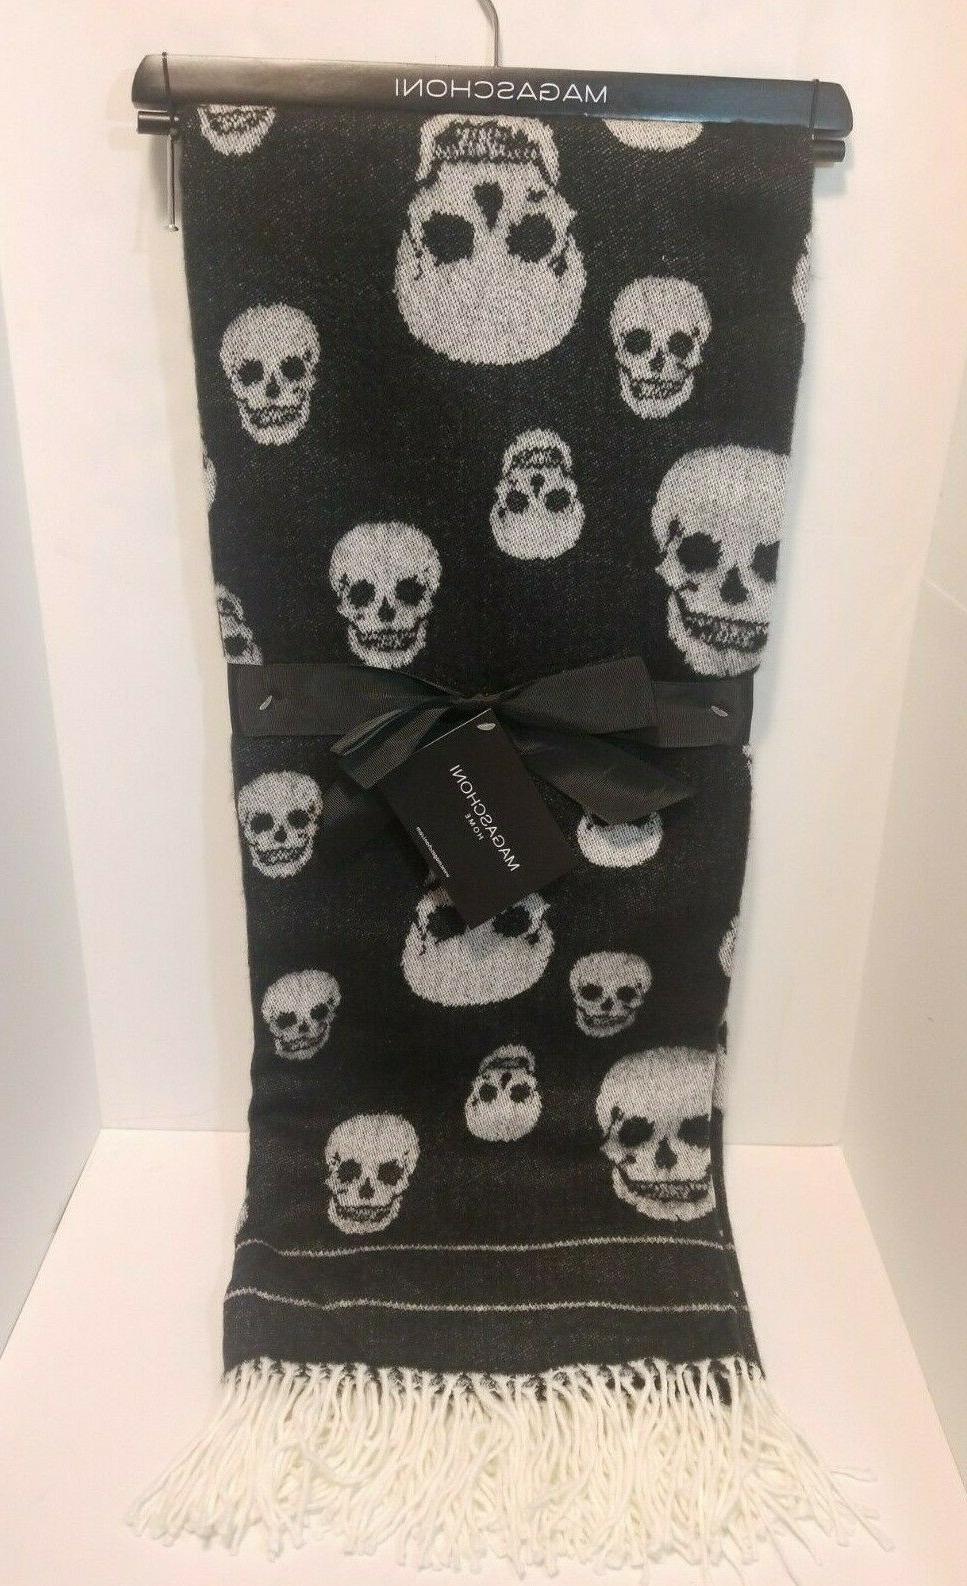 Magaschoni Throw Blanket Decorative Skull Skulls Black White